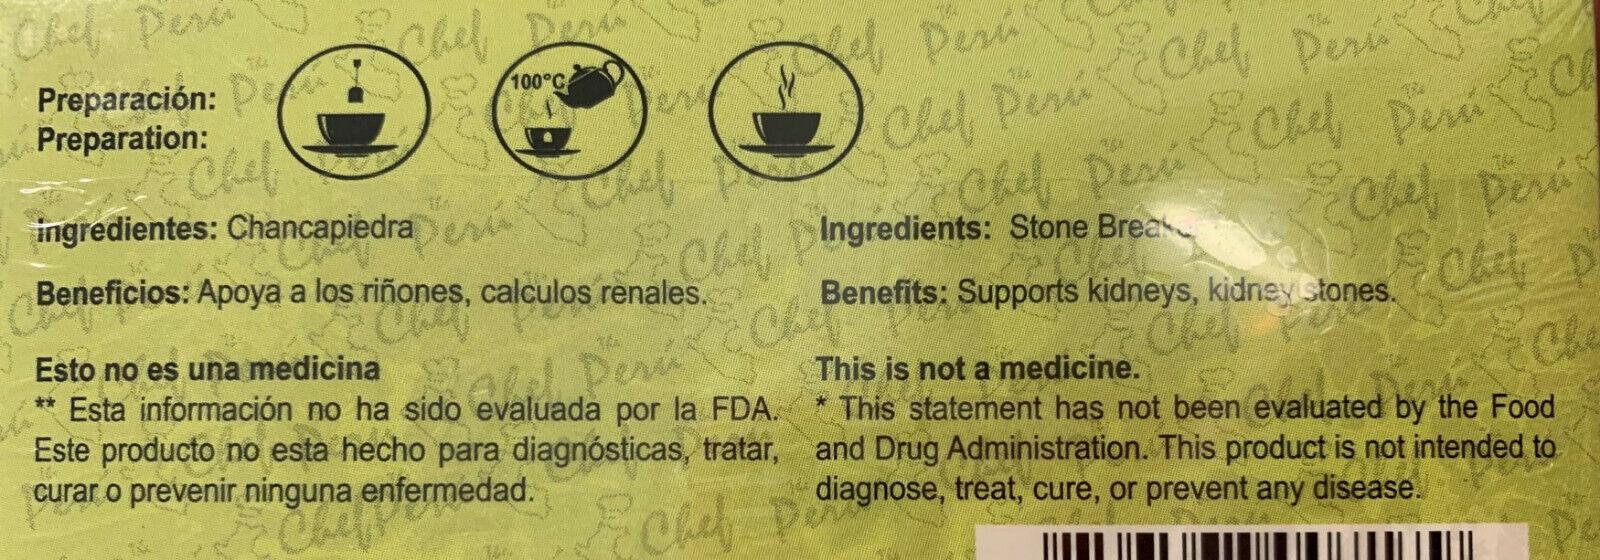 Chanca Piedra Hierba Te (Stone Braker Herbs Tea) 3 Bags 5